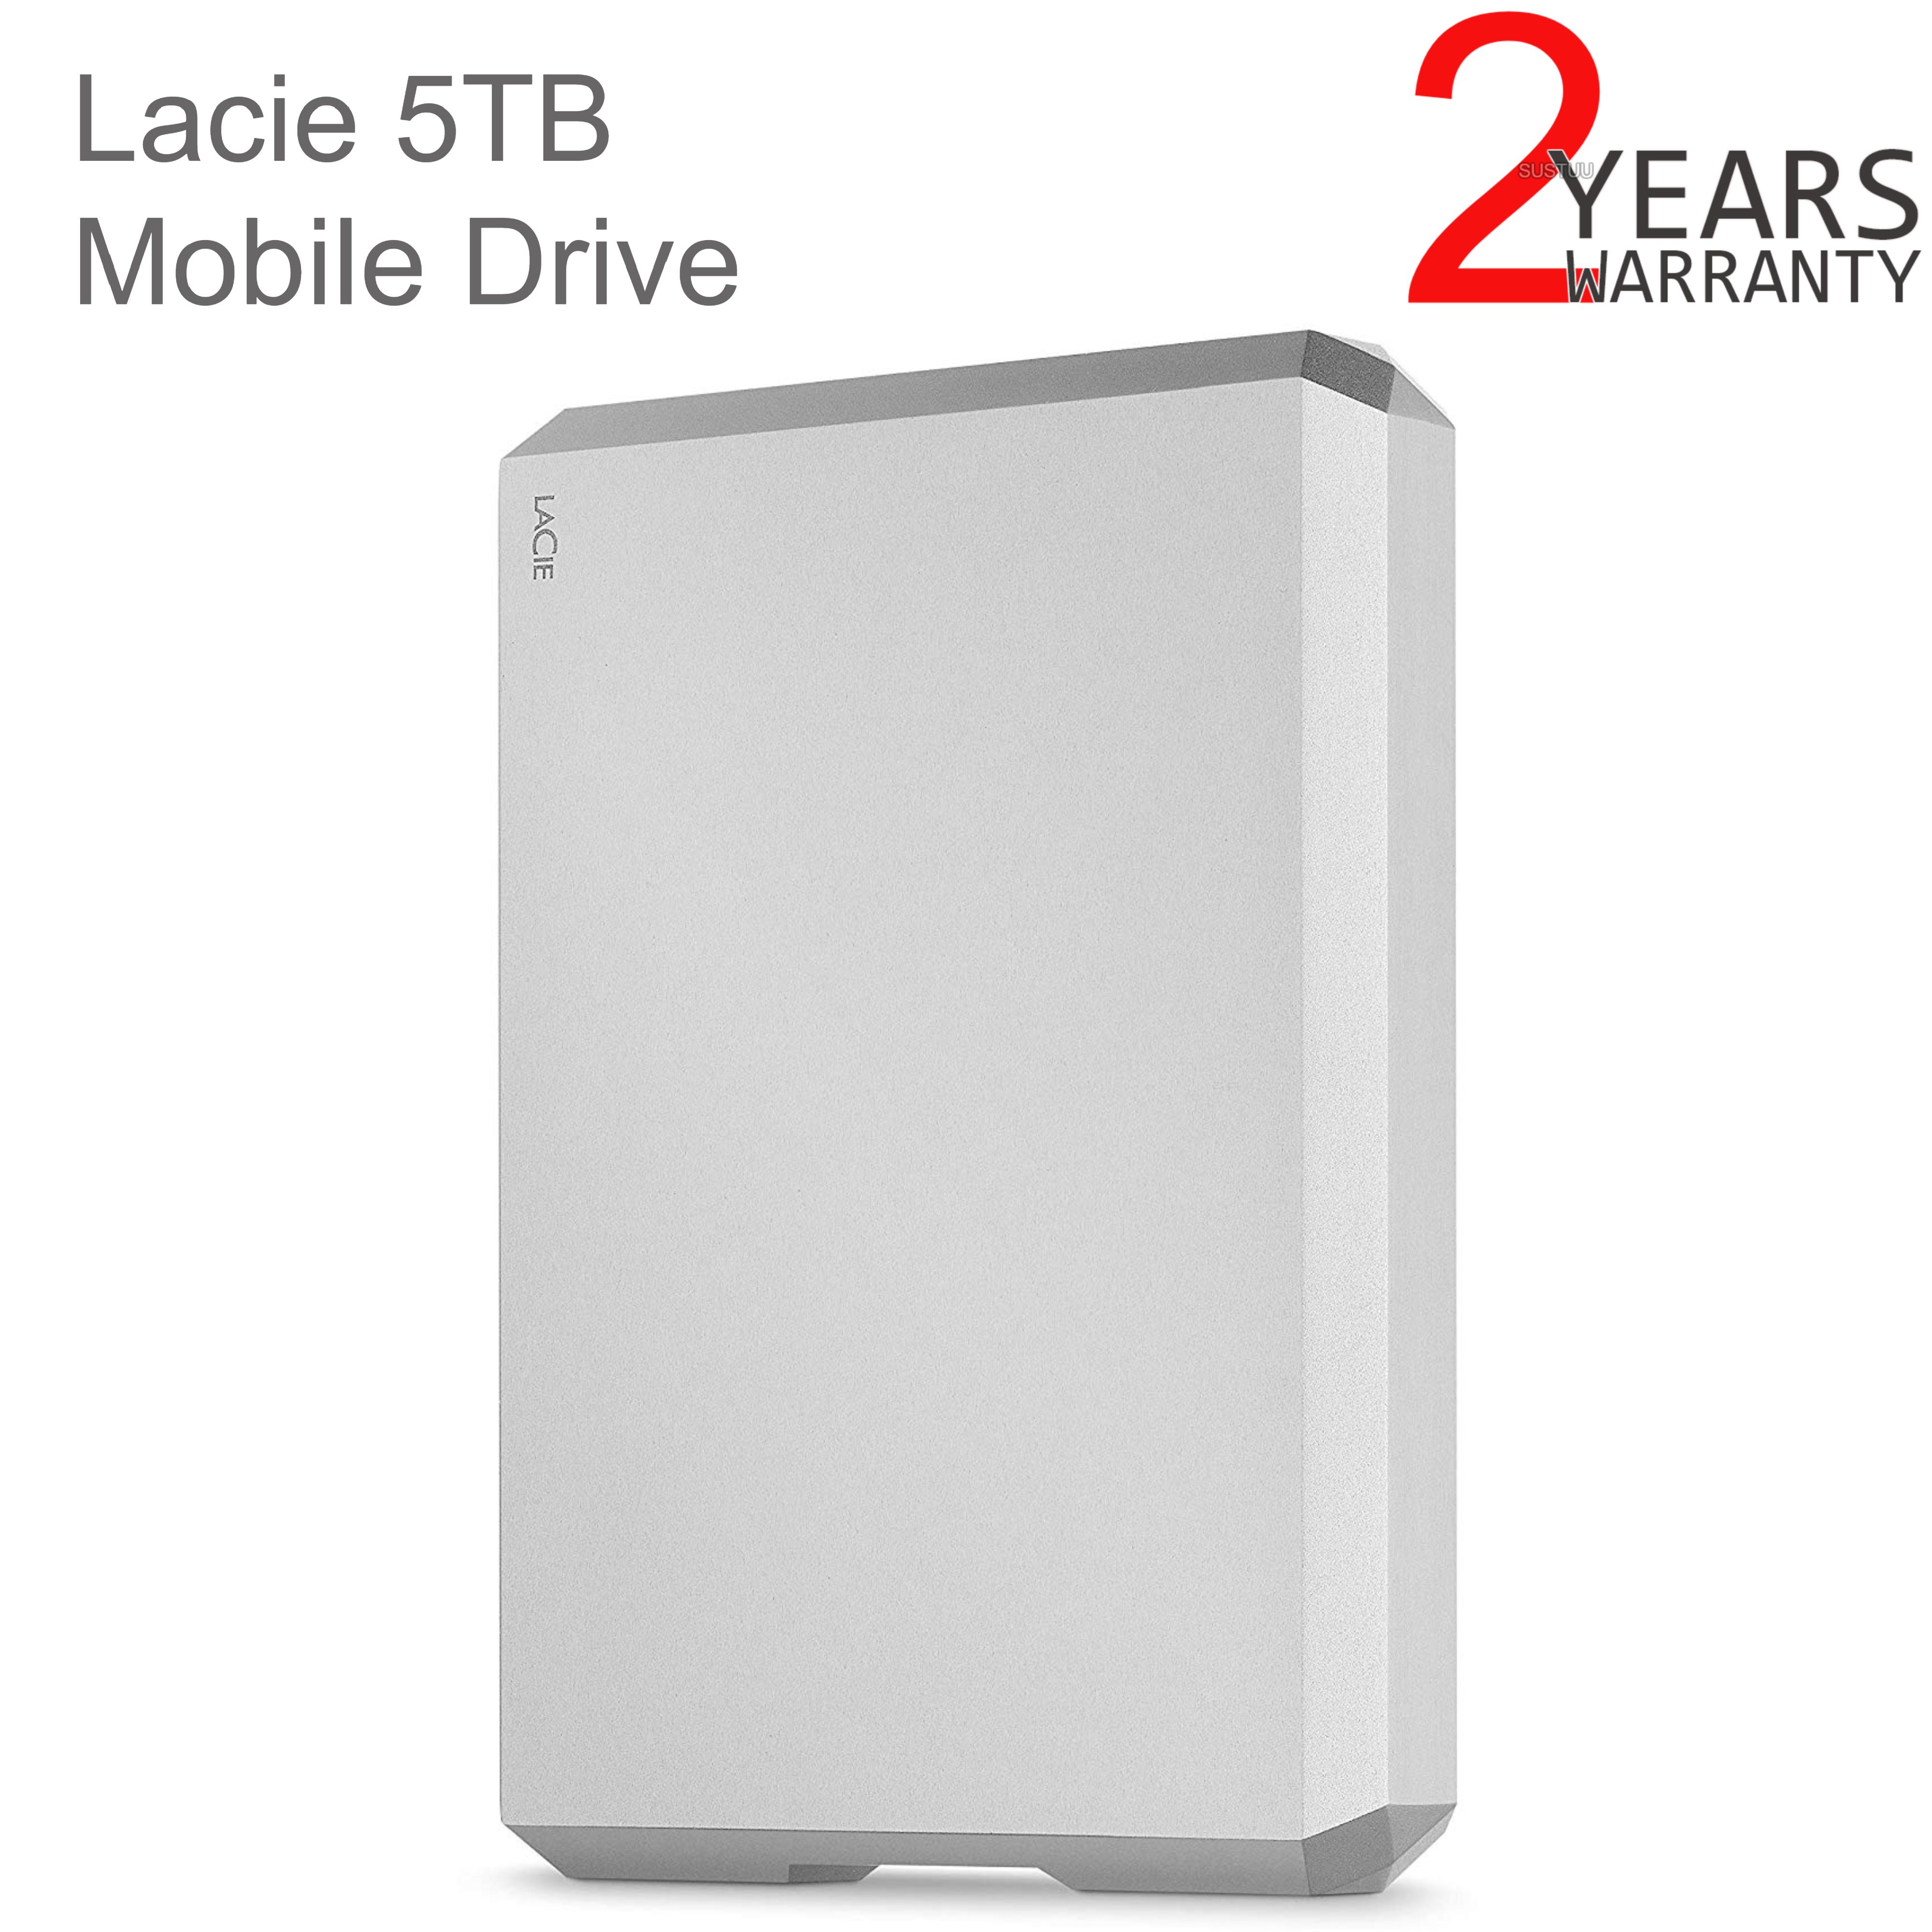 Lacie 5TB Mobile Drive | USB 3.0 Type-C Portable External Hard Drive | For PC & Mac | Storage